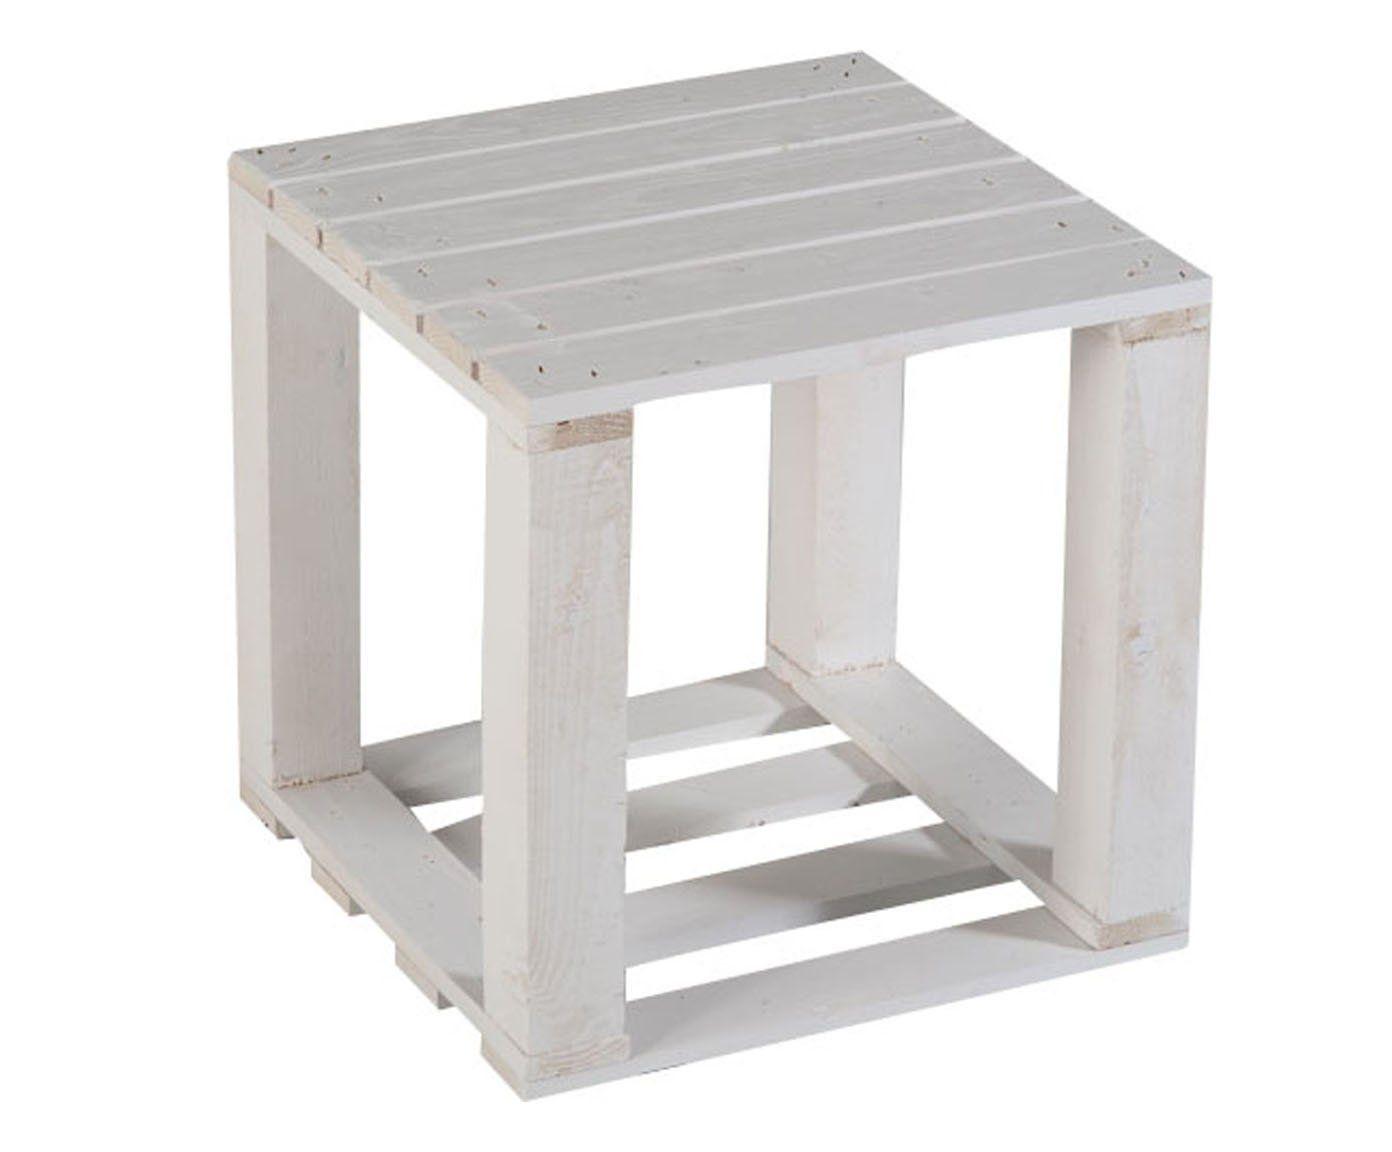 Pallet tavolino ~ Castagnetti pallet tavolino comodino legno abete bianco